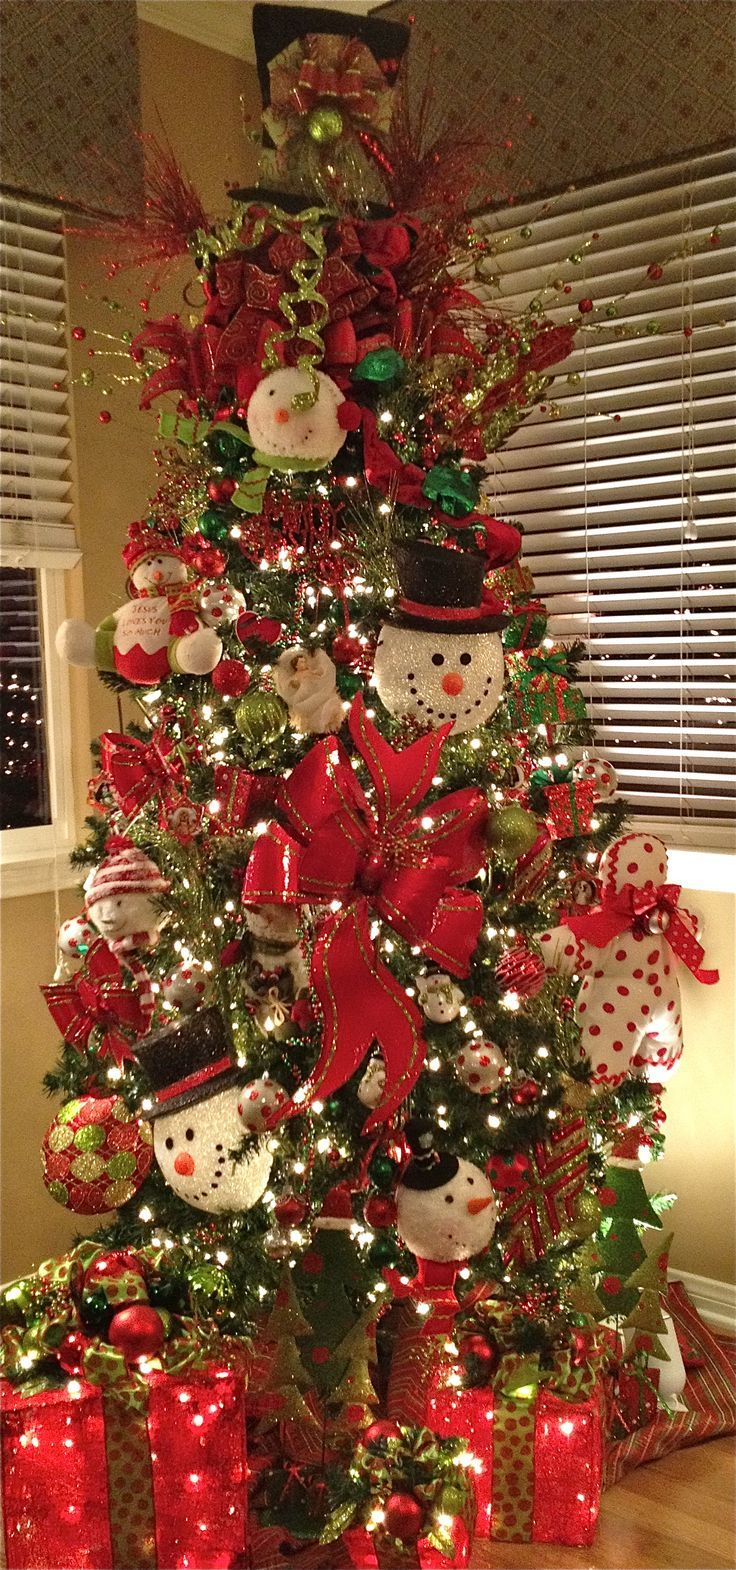 50 festive christmas tree decorating ideas all around the rh pinterest com